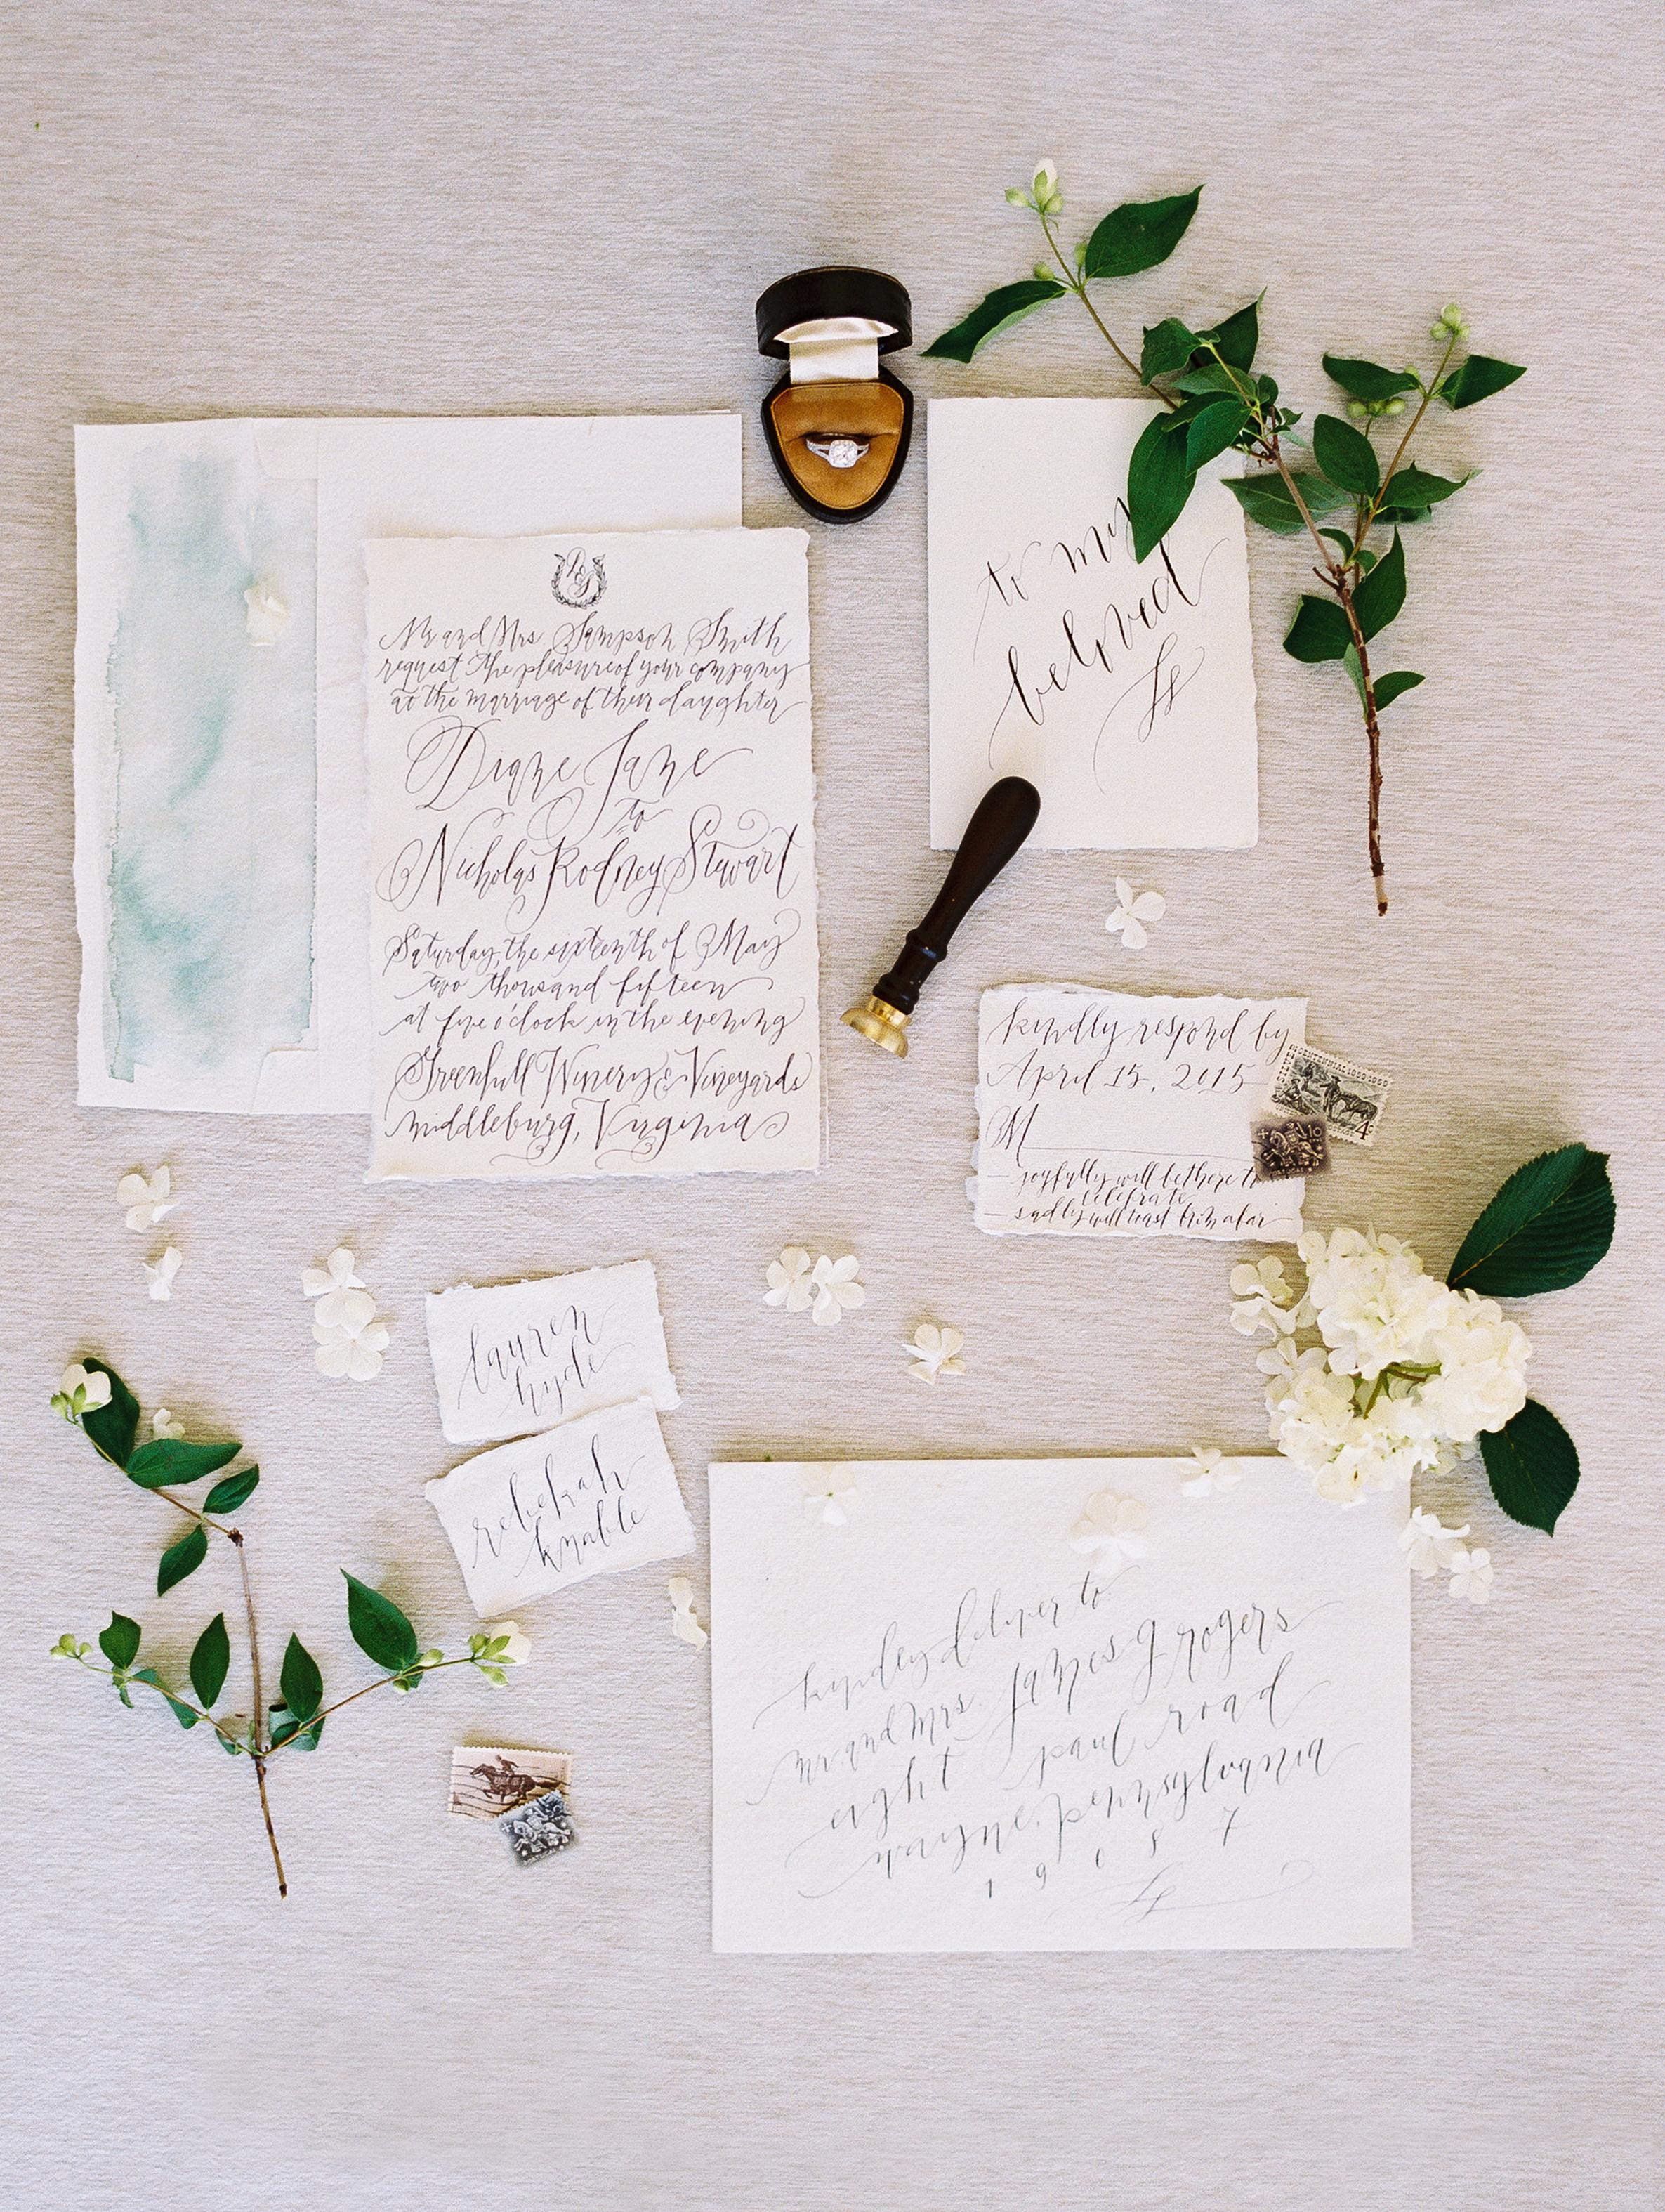 Middleburg Wedding Inspiration | Wild Green Yonder